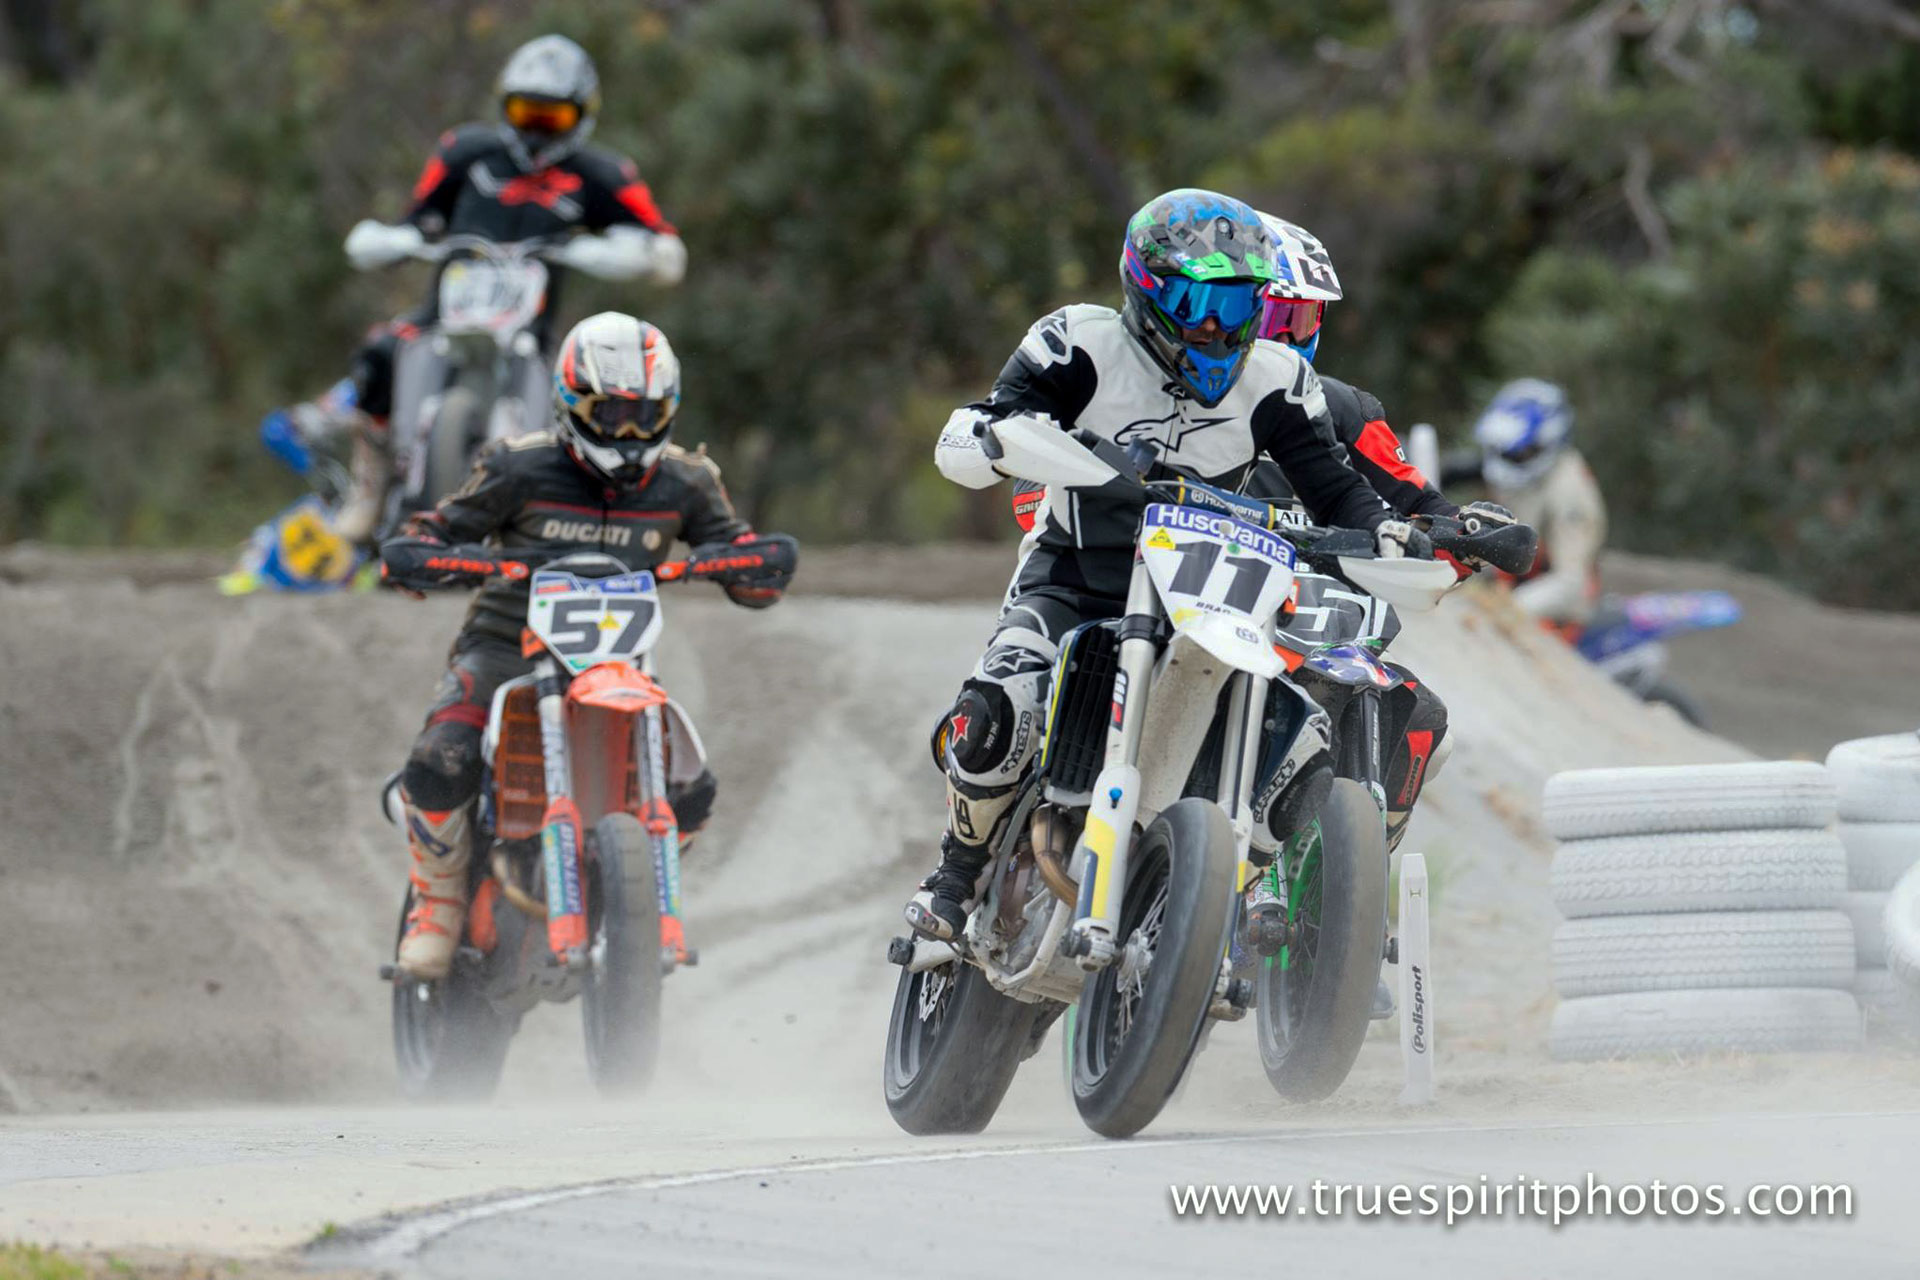 2017 Australian Supermoto Championships Wrap Up Bike Review